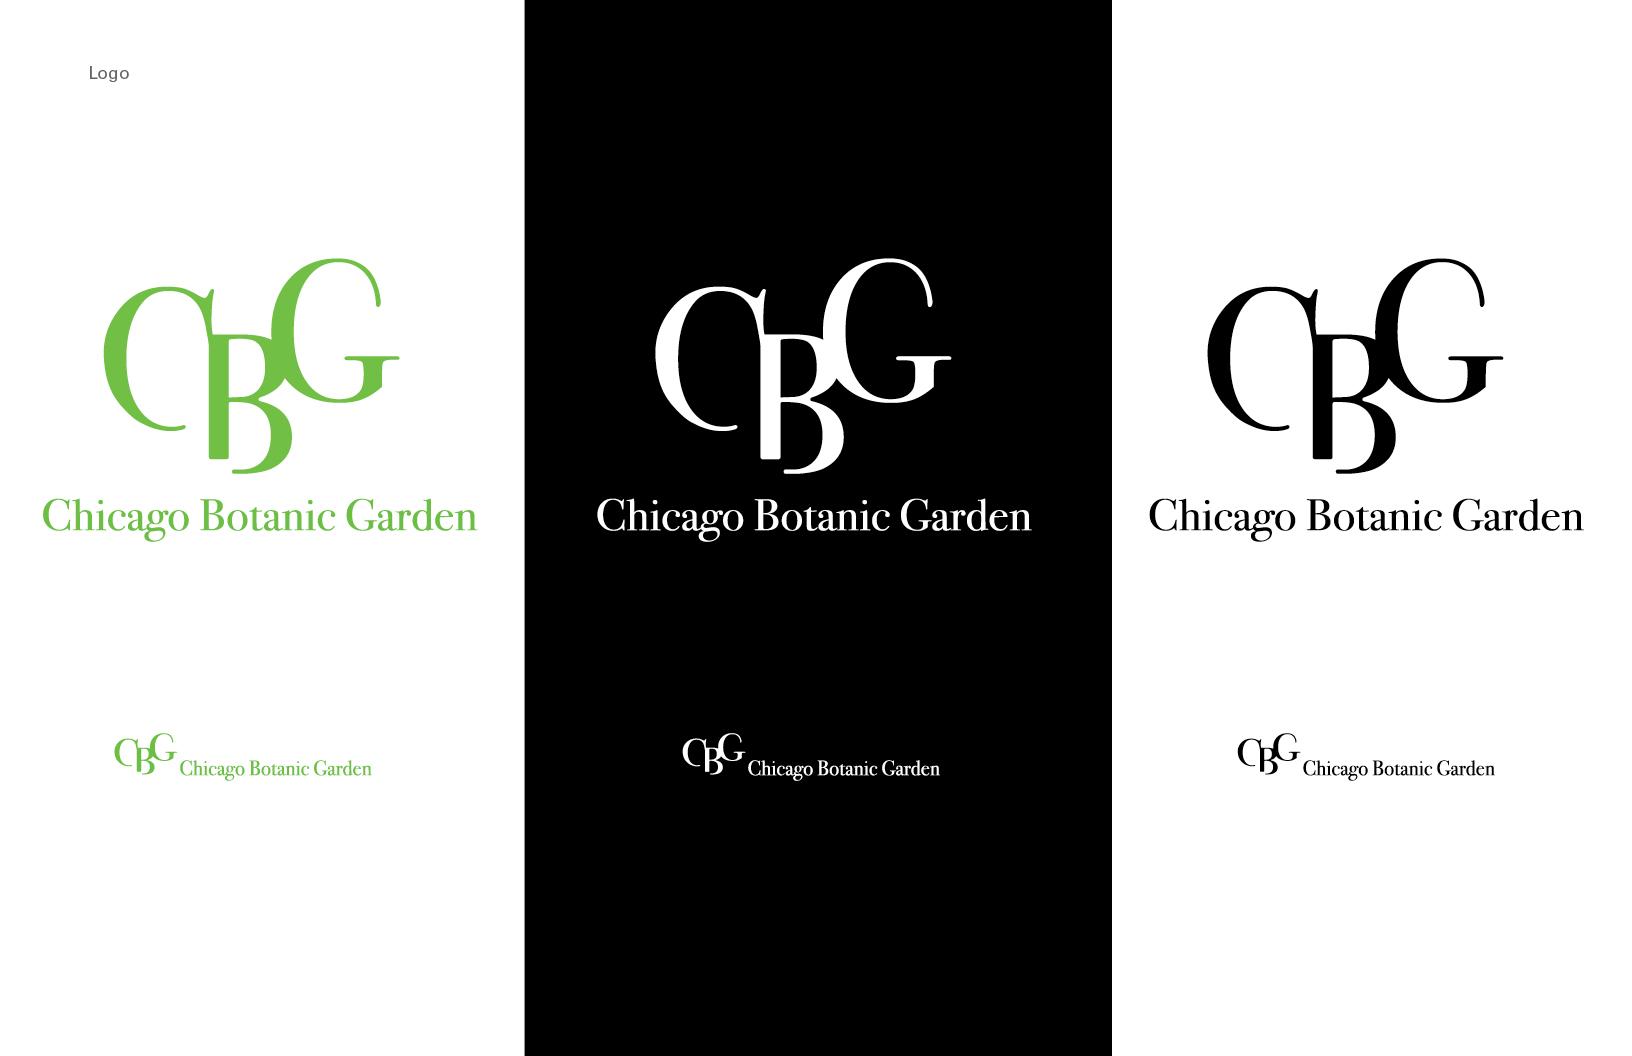 CBG logo.jpg